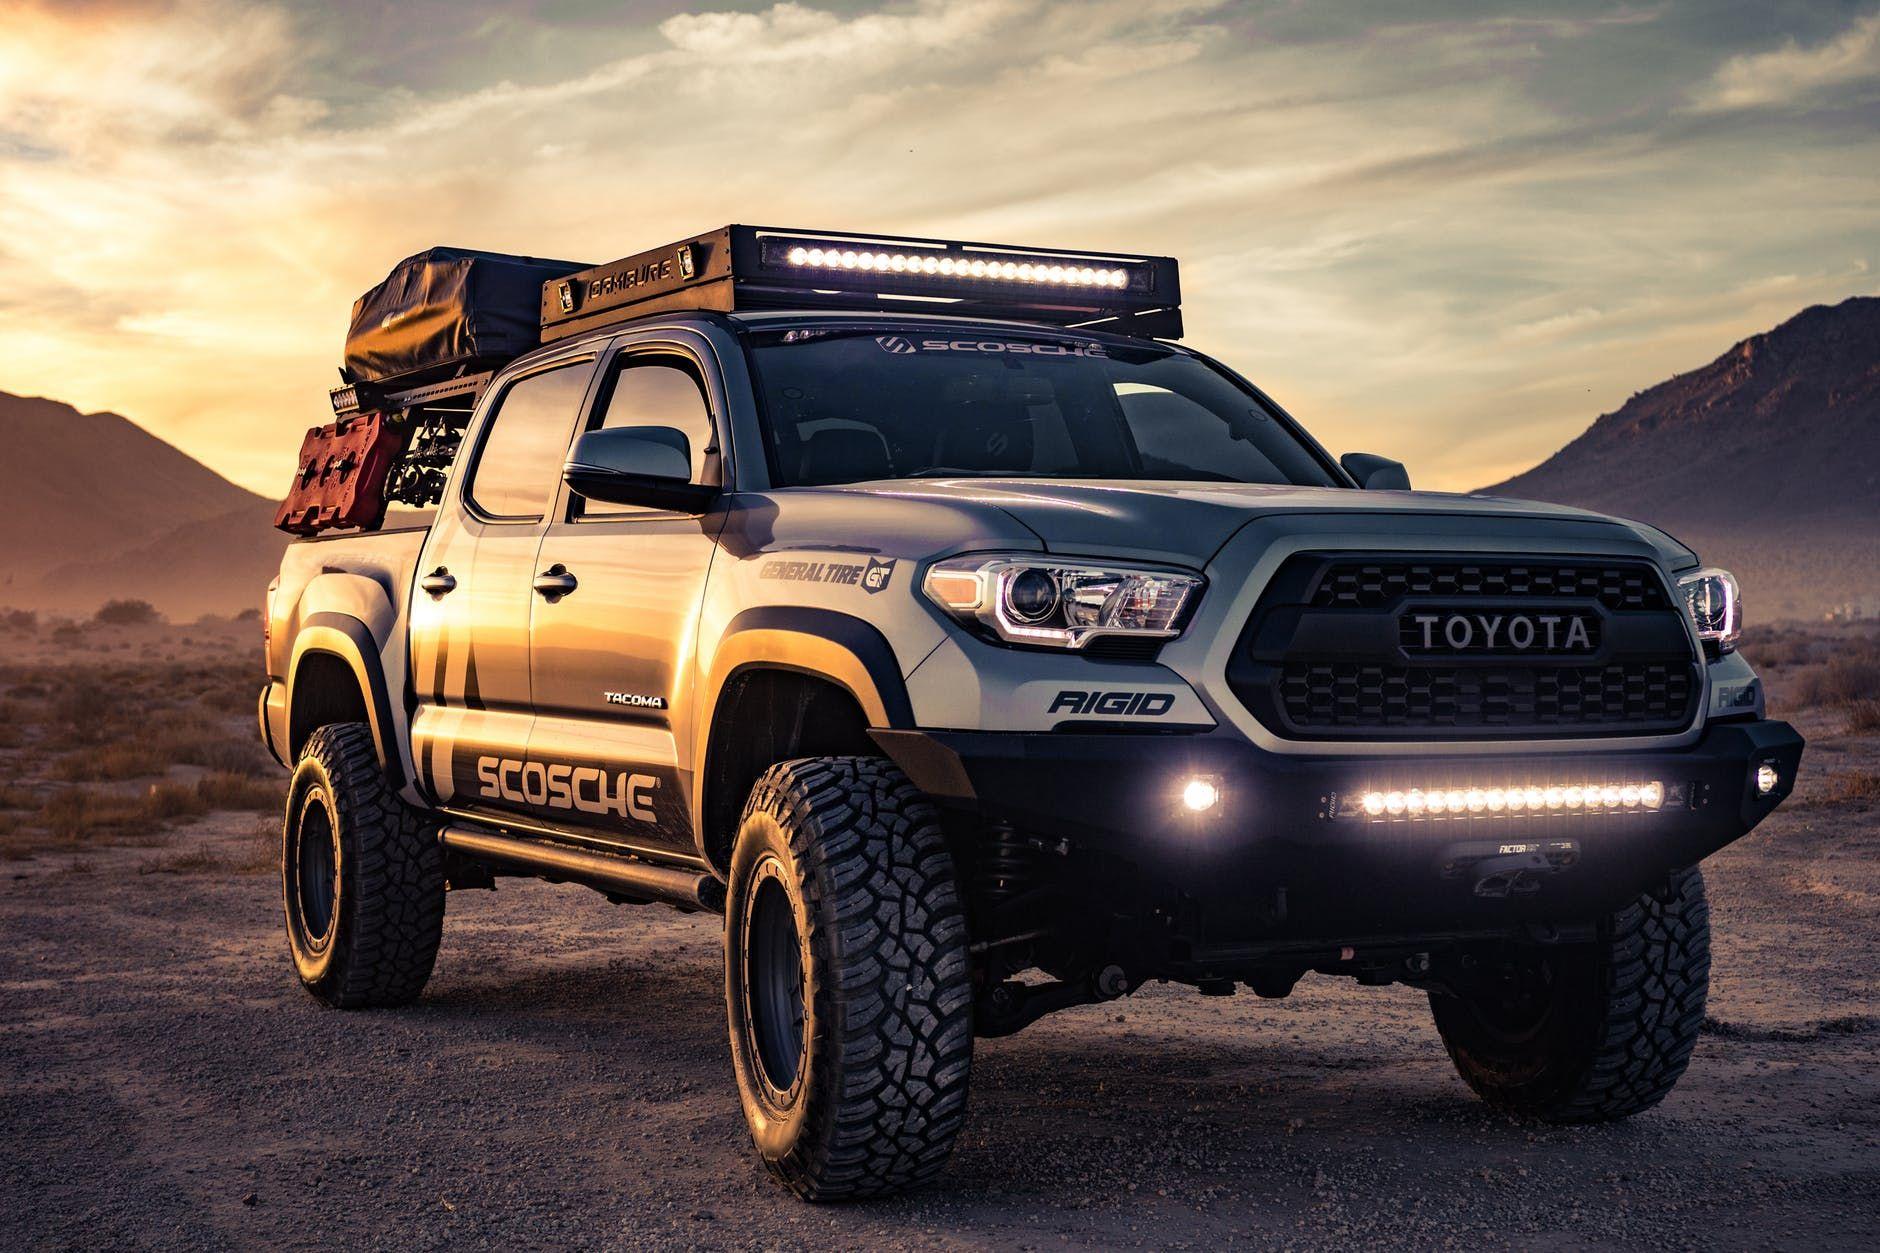 Kekurangan Toyota Offroad Spesifikasi